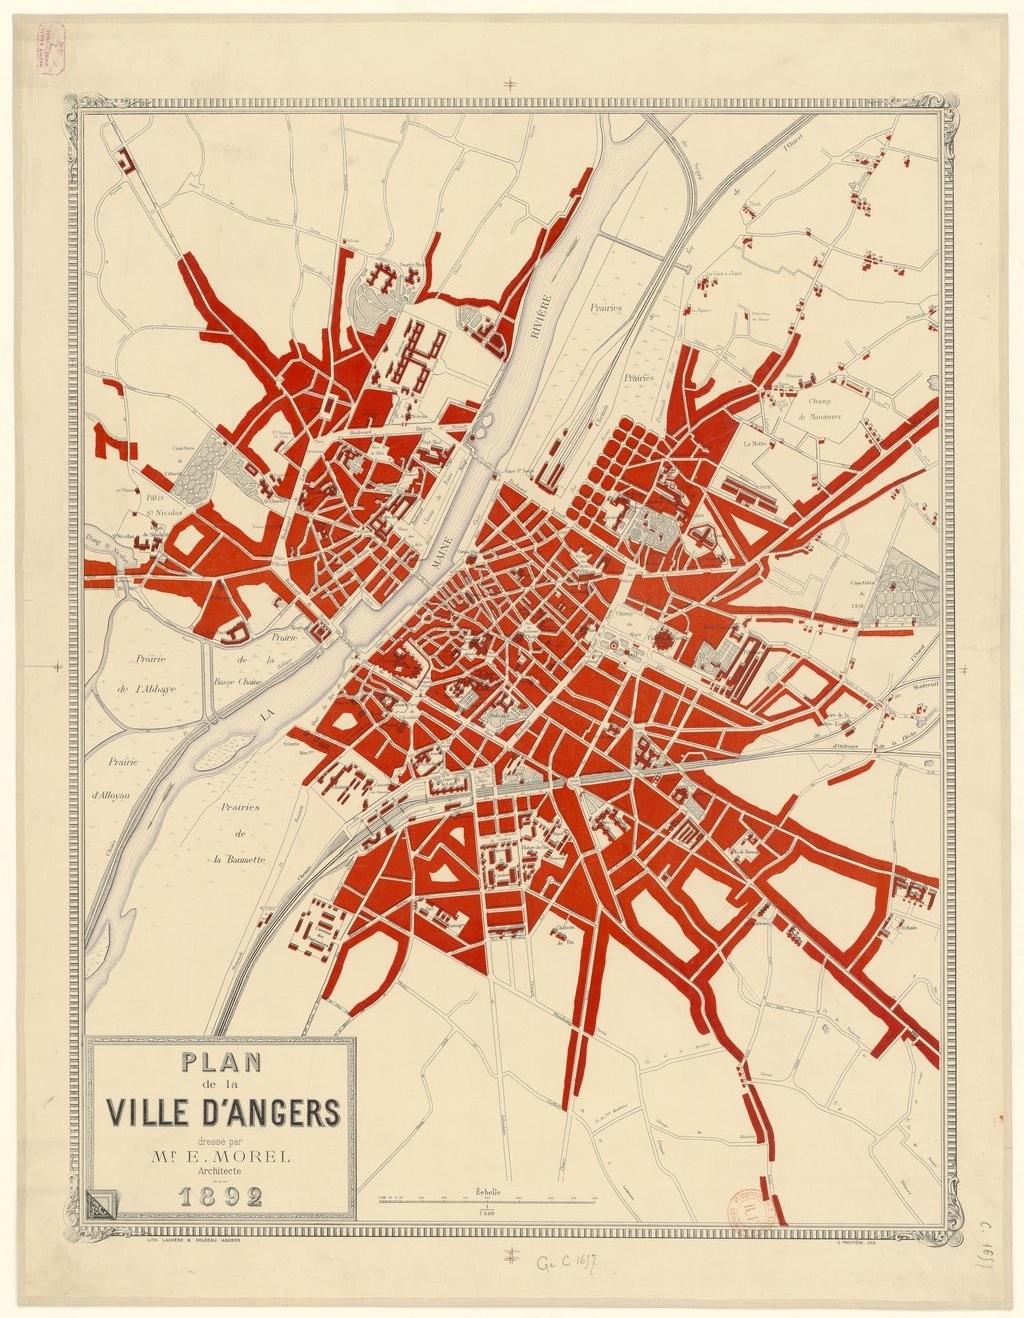 GE C-1657 Plan_de_la_ville_d'Angers_[...]Morel_E_btv1b53028043k_edited